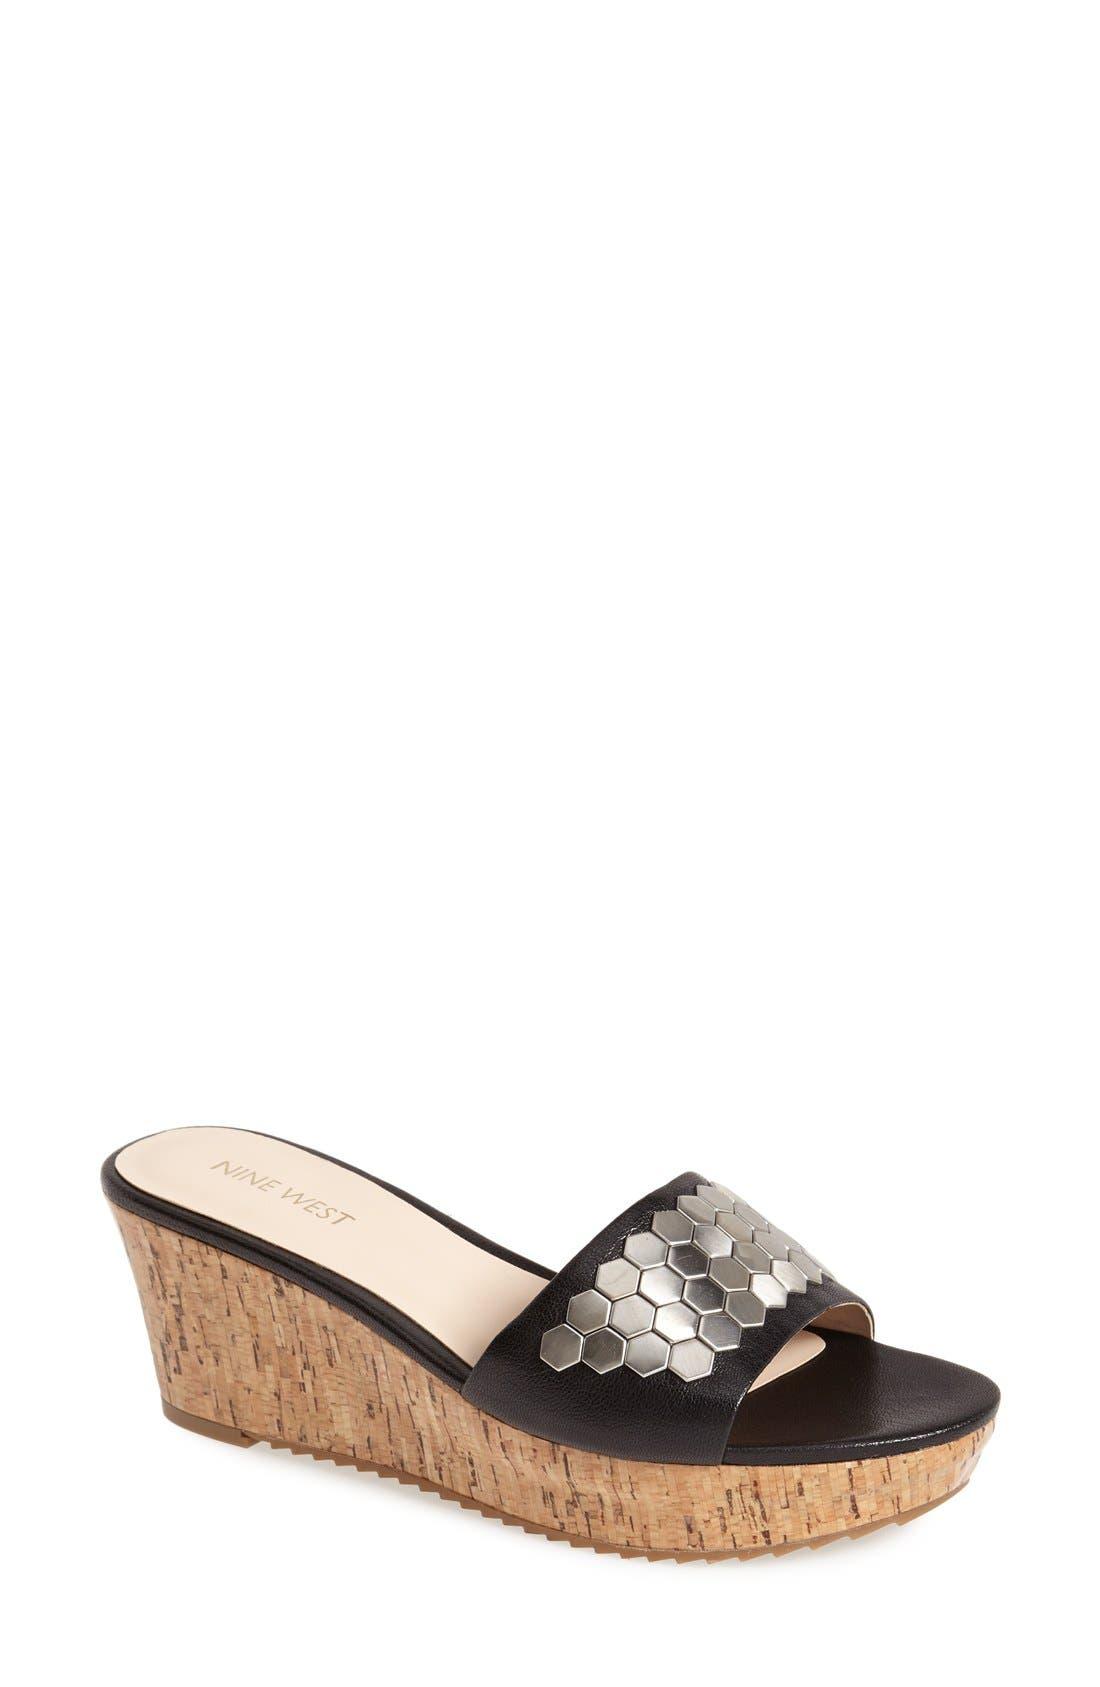 Alternate Image 1 Selected - Nine West 'Casandre' Slide Sandal (Women)